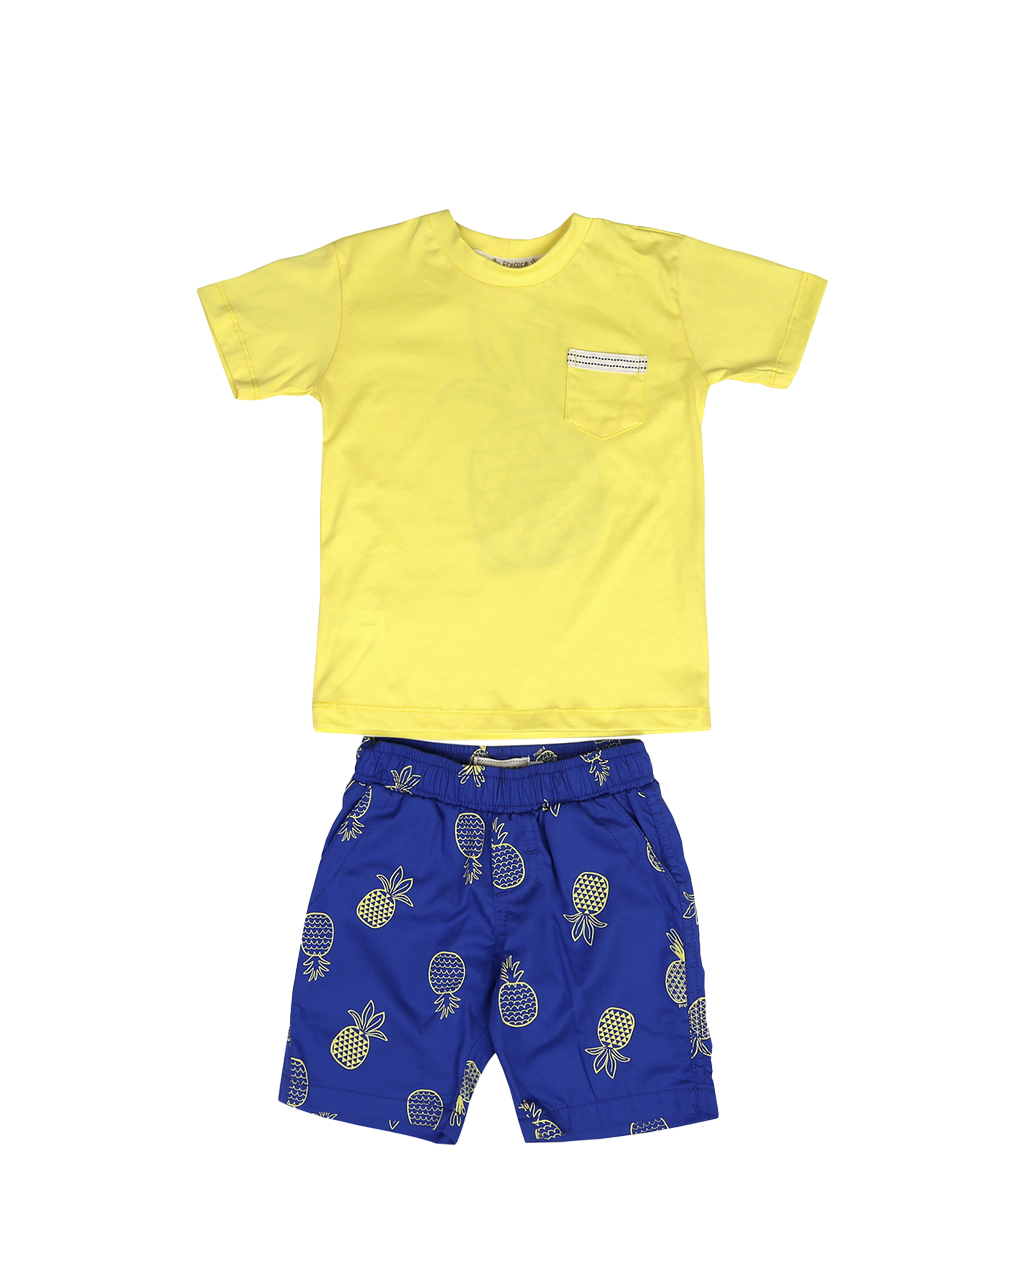 Conjunto Infantil Blusa Bolso Amarela com Shorts Azul Abacaxi Precoce